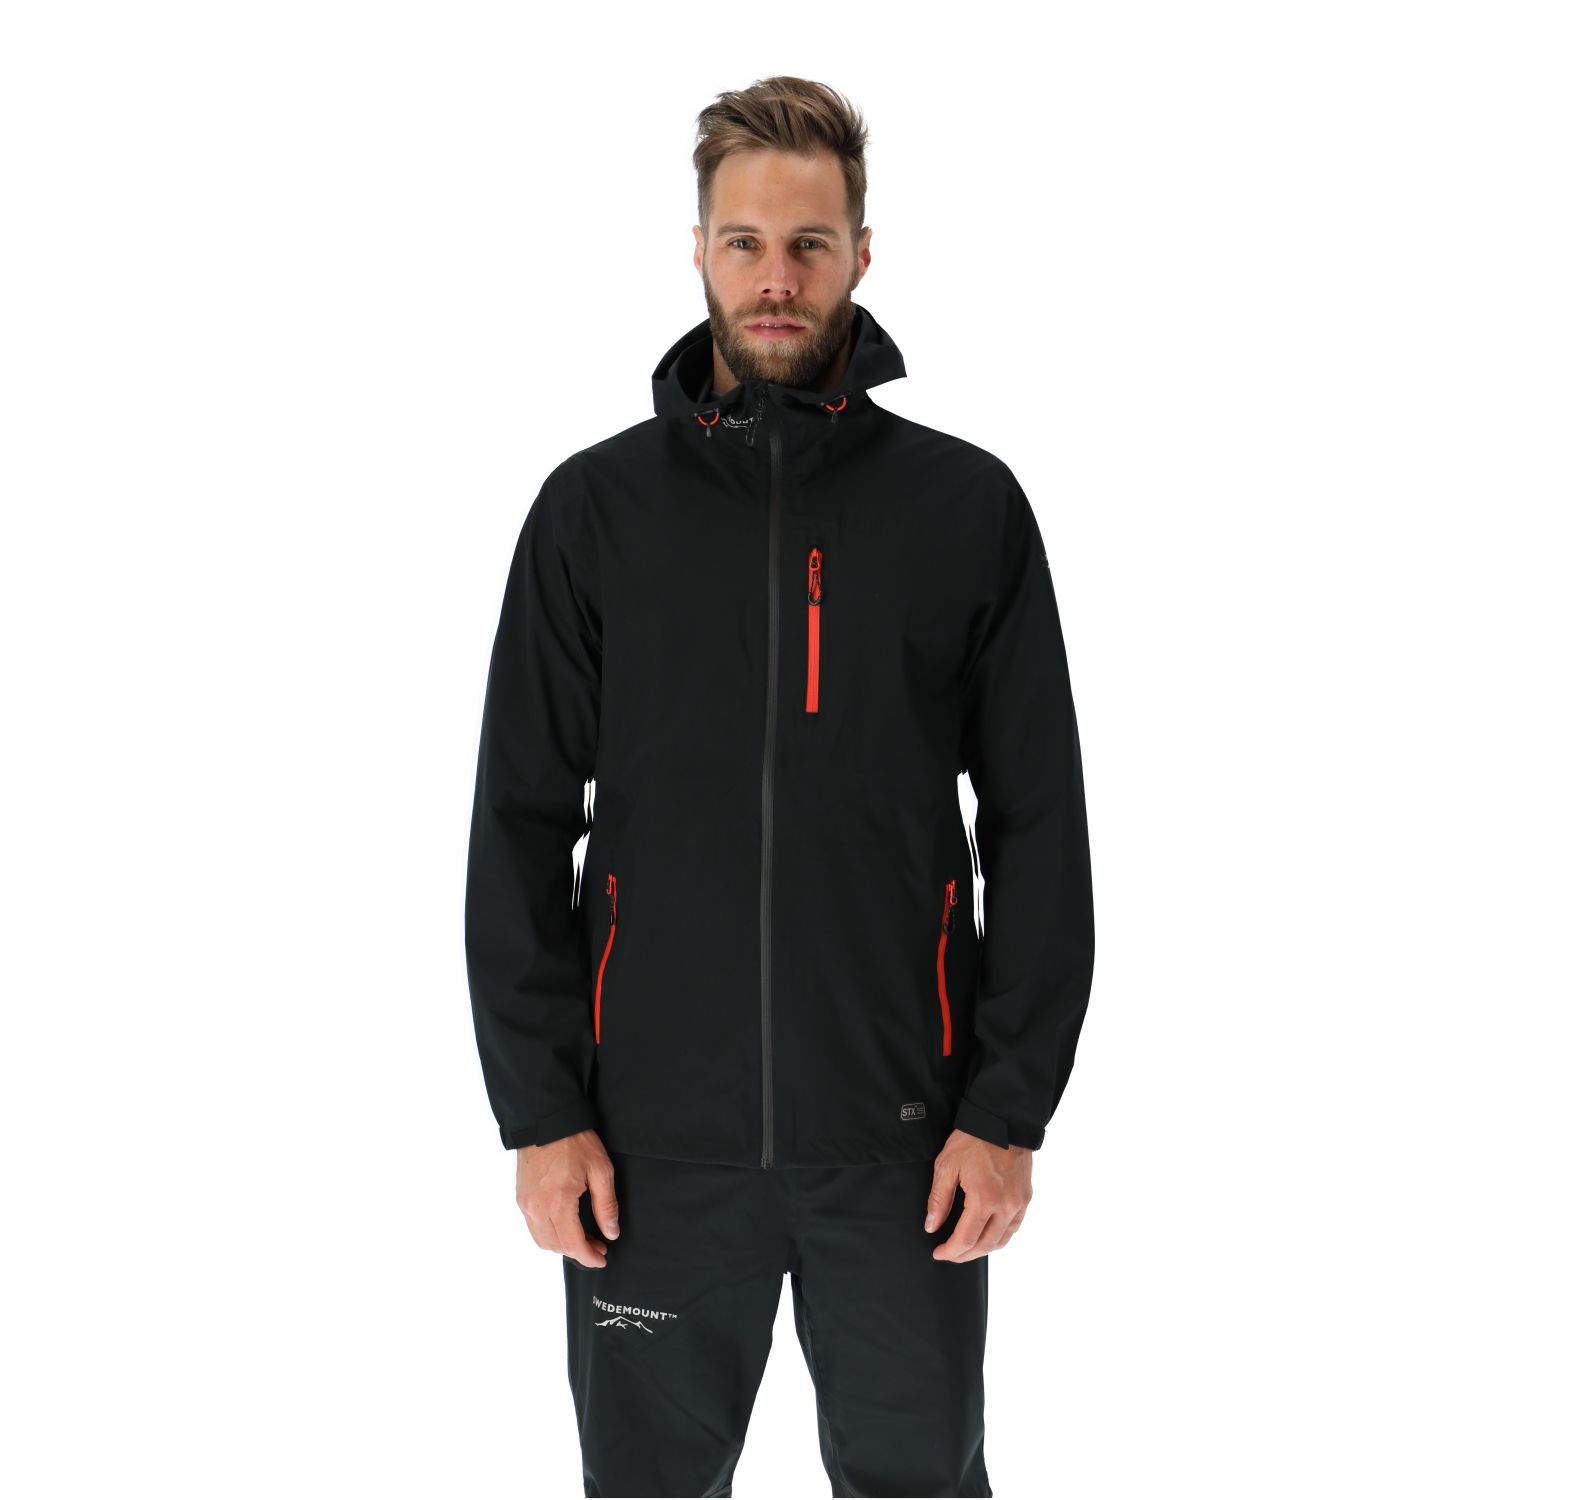 Multi Layer Stretch Rain Jacket, Black, Xl,  Swedemount Jackor